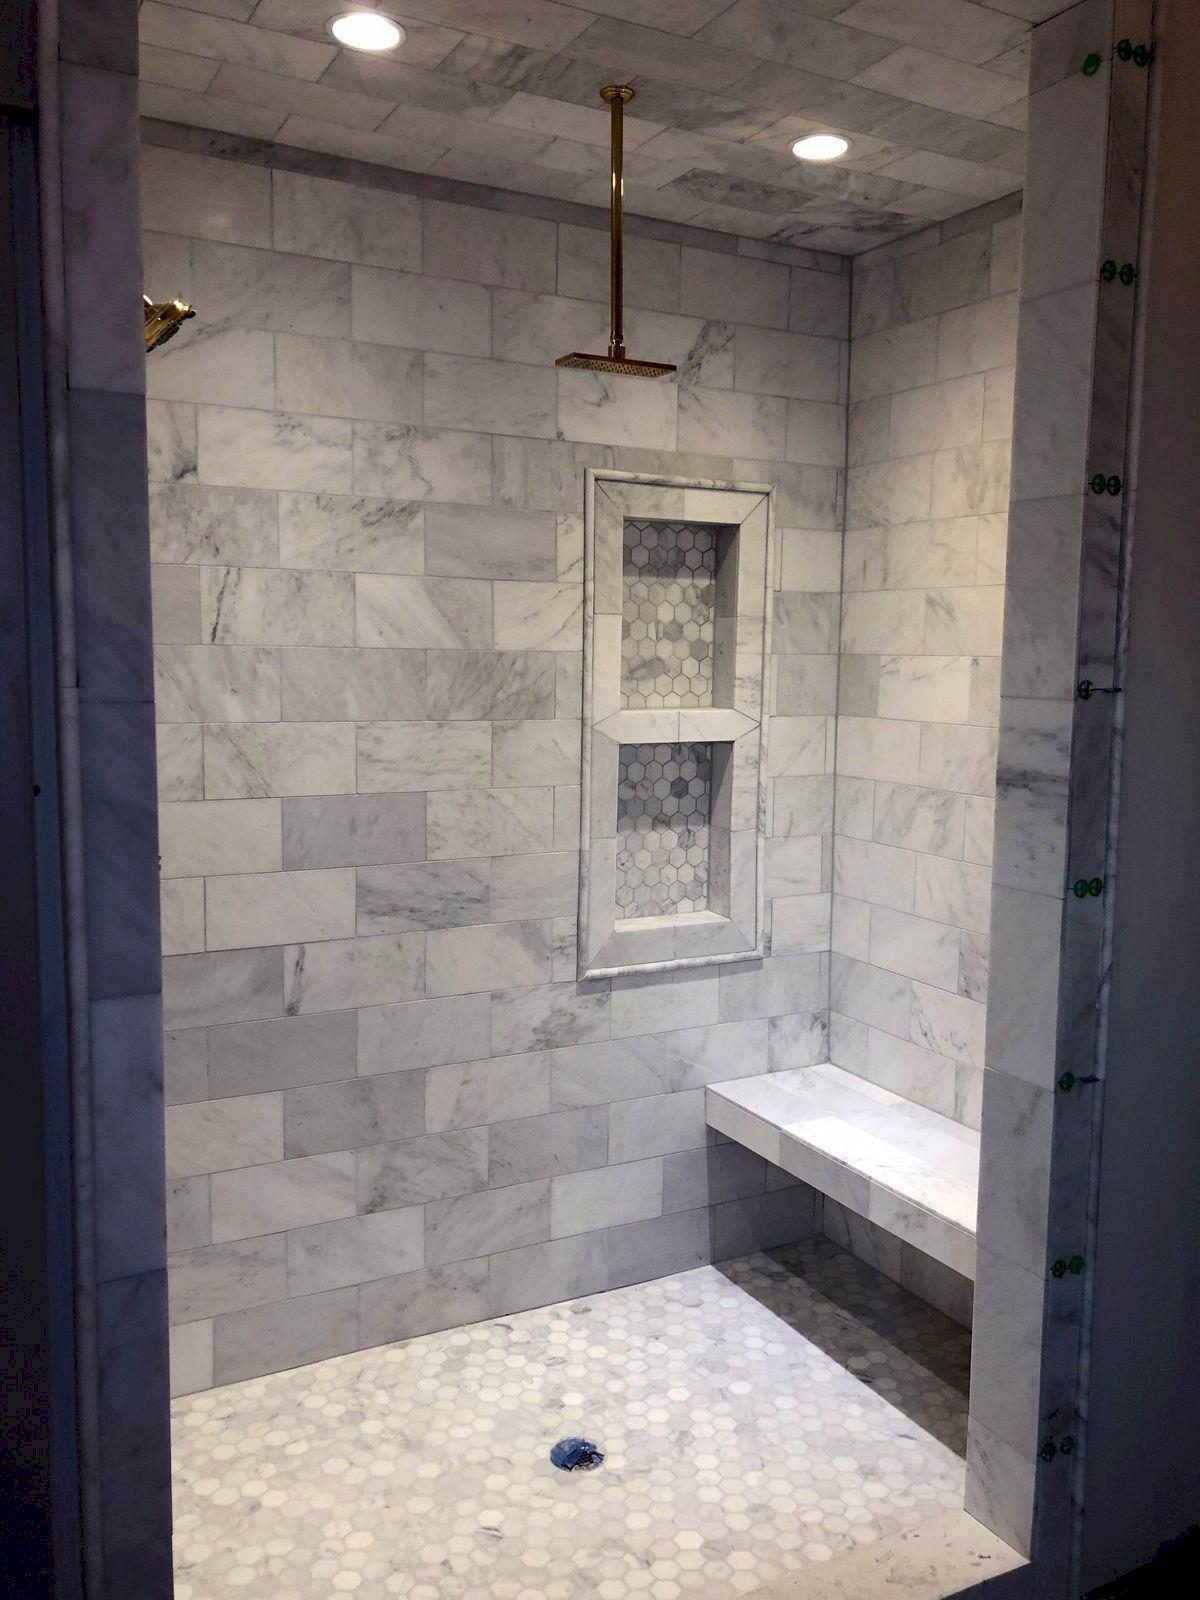 50 Cool Shower Design Ideas For Your Bathroom Bathroom Remodel Shower Tile Bathroom Bathroom Shower Tile